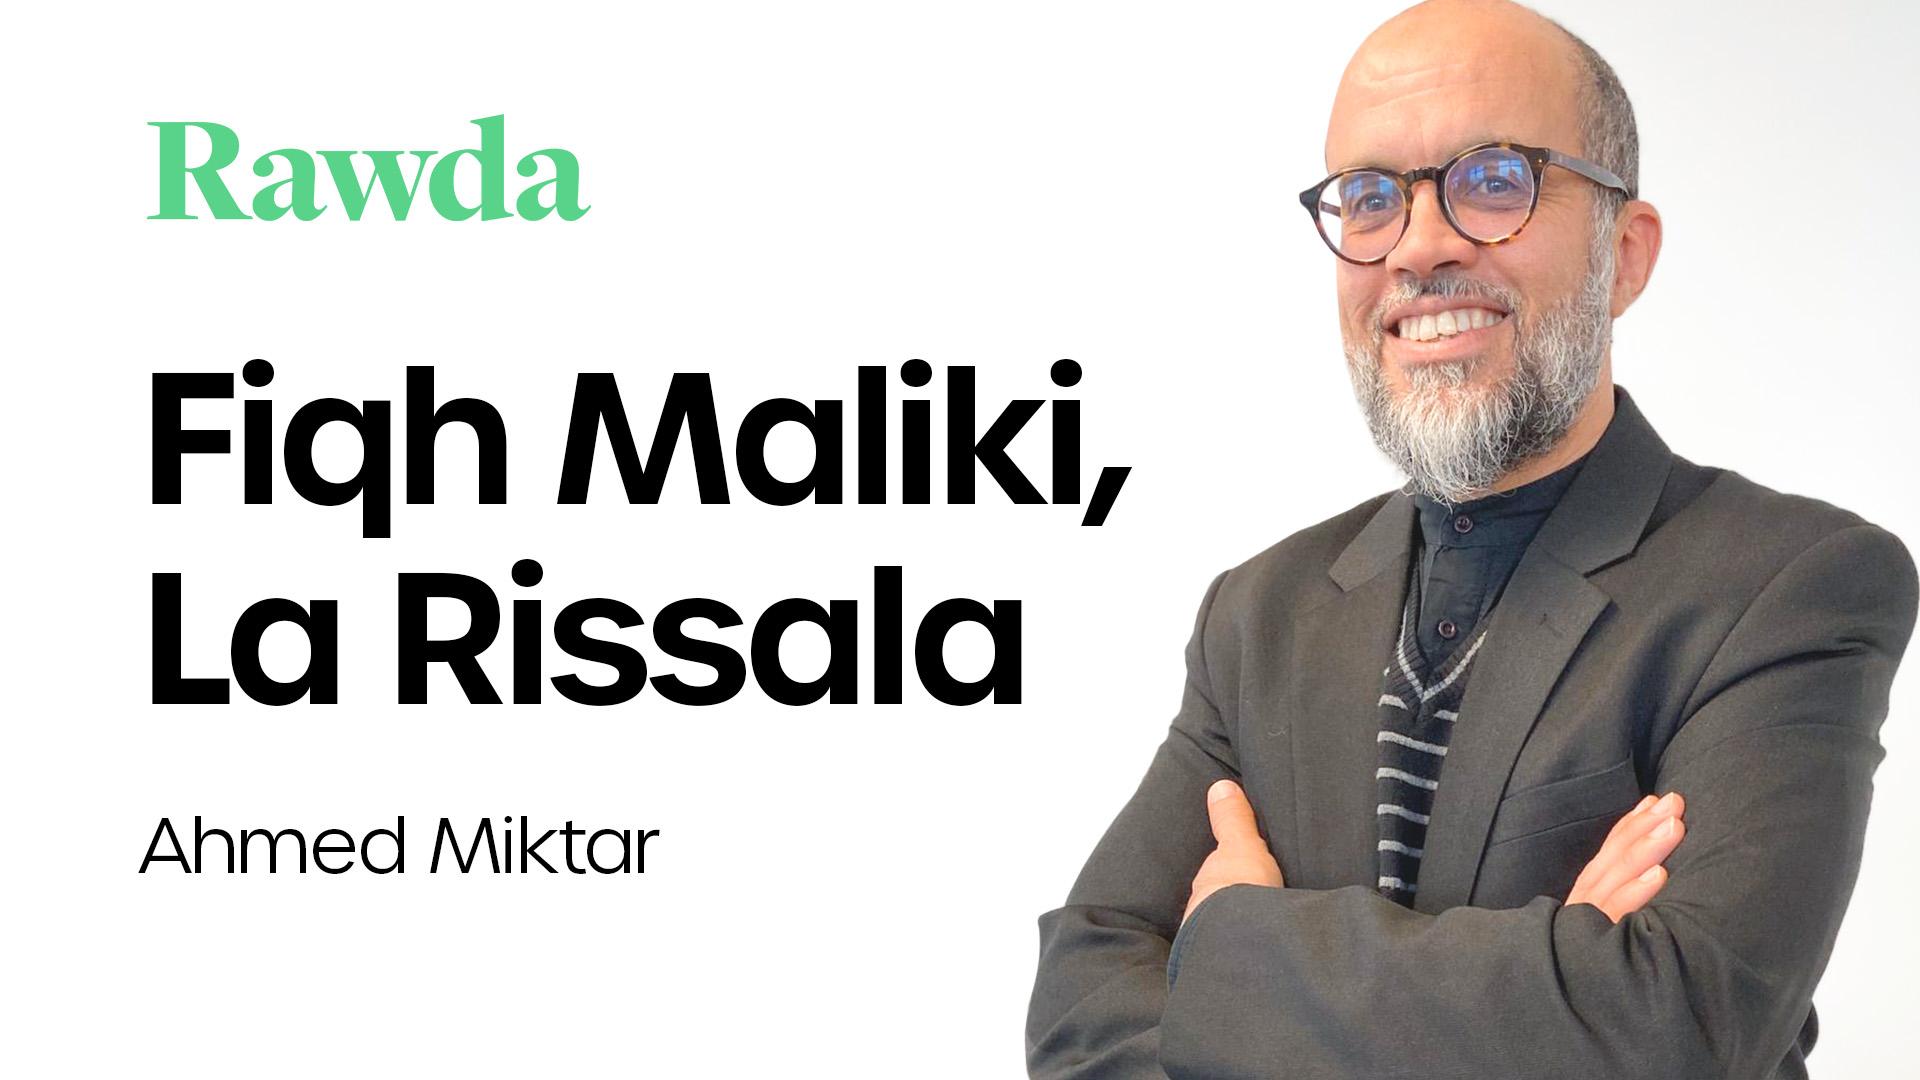 Miniature du cours : Fiqh Maliki, la Rissala